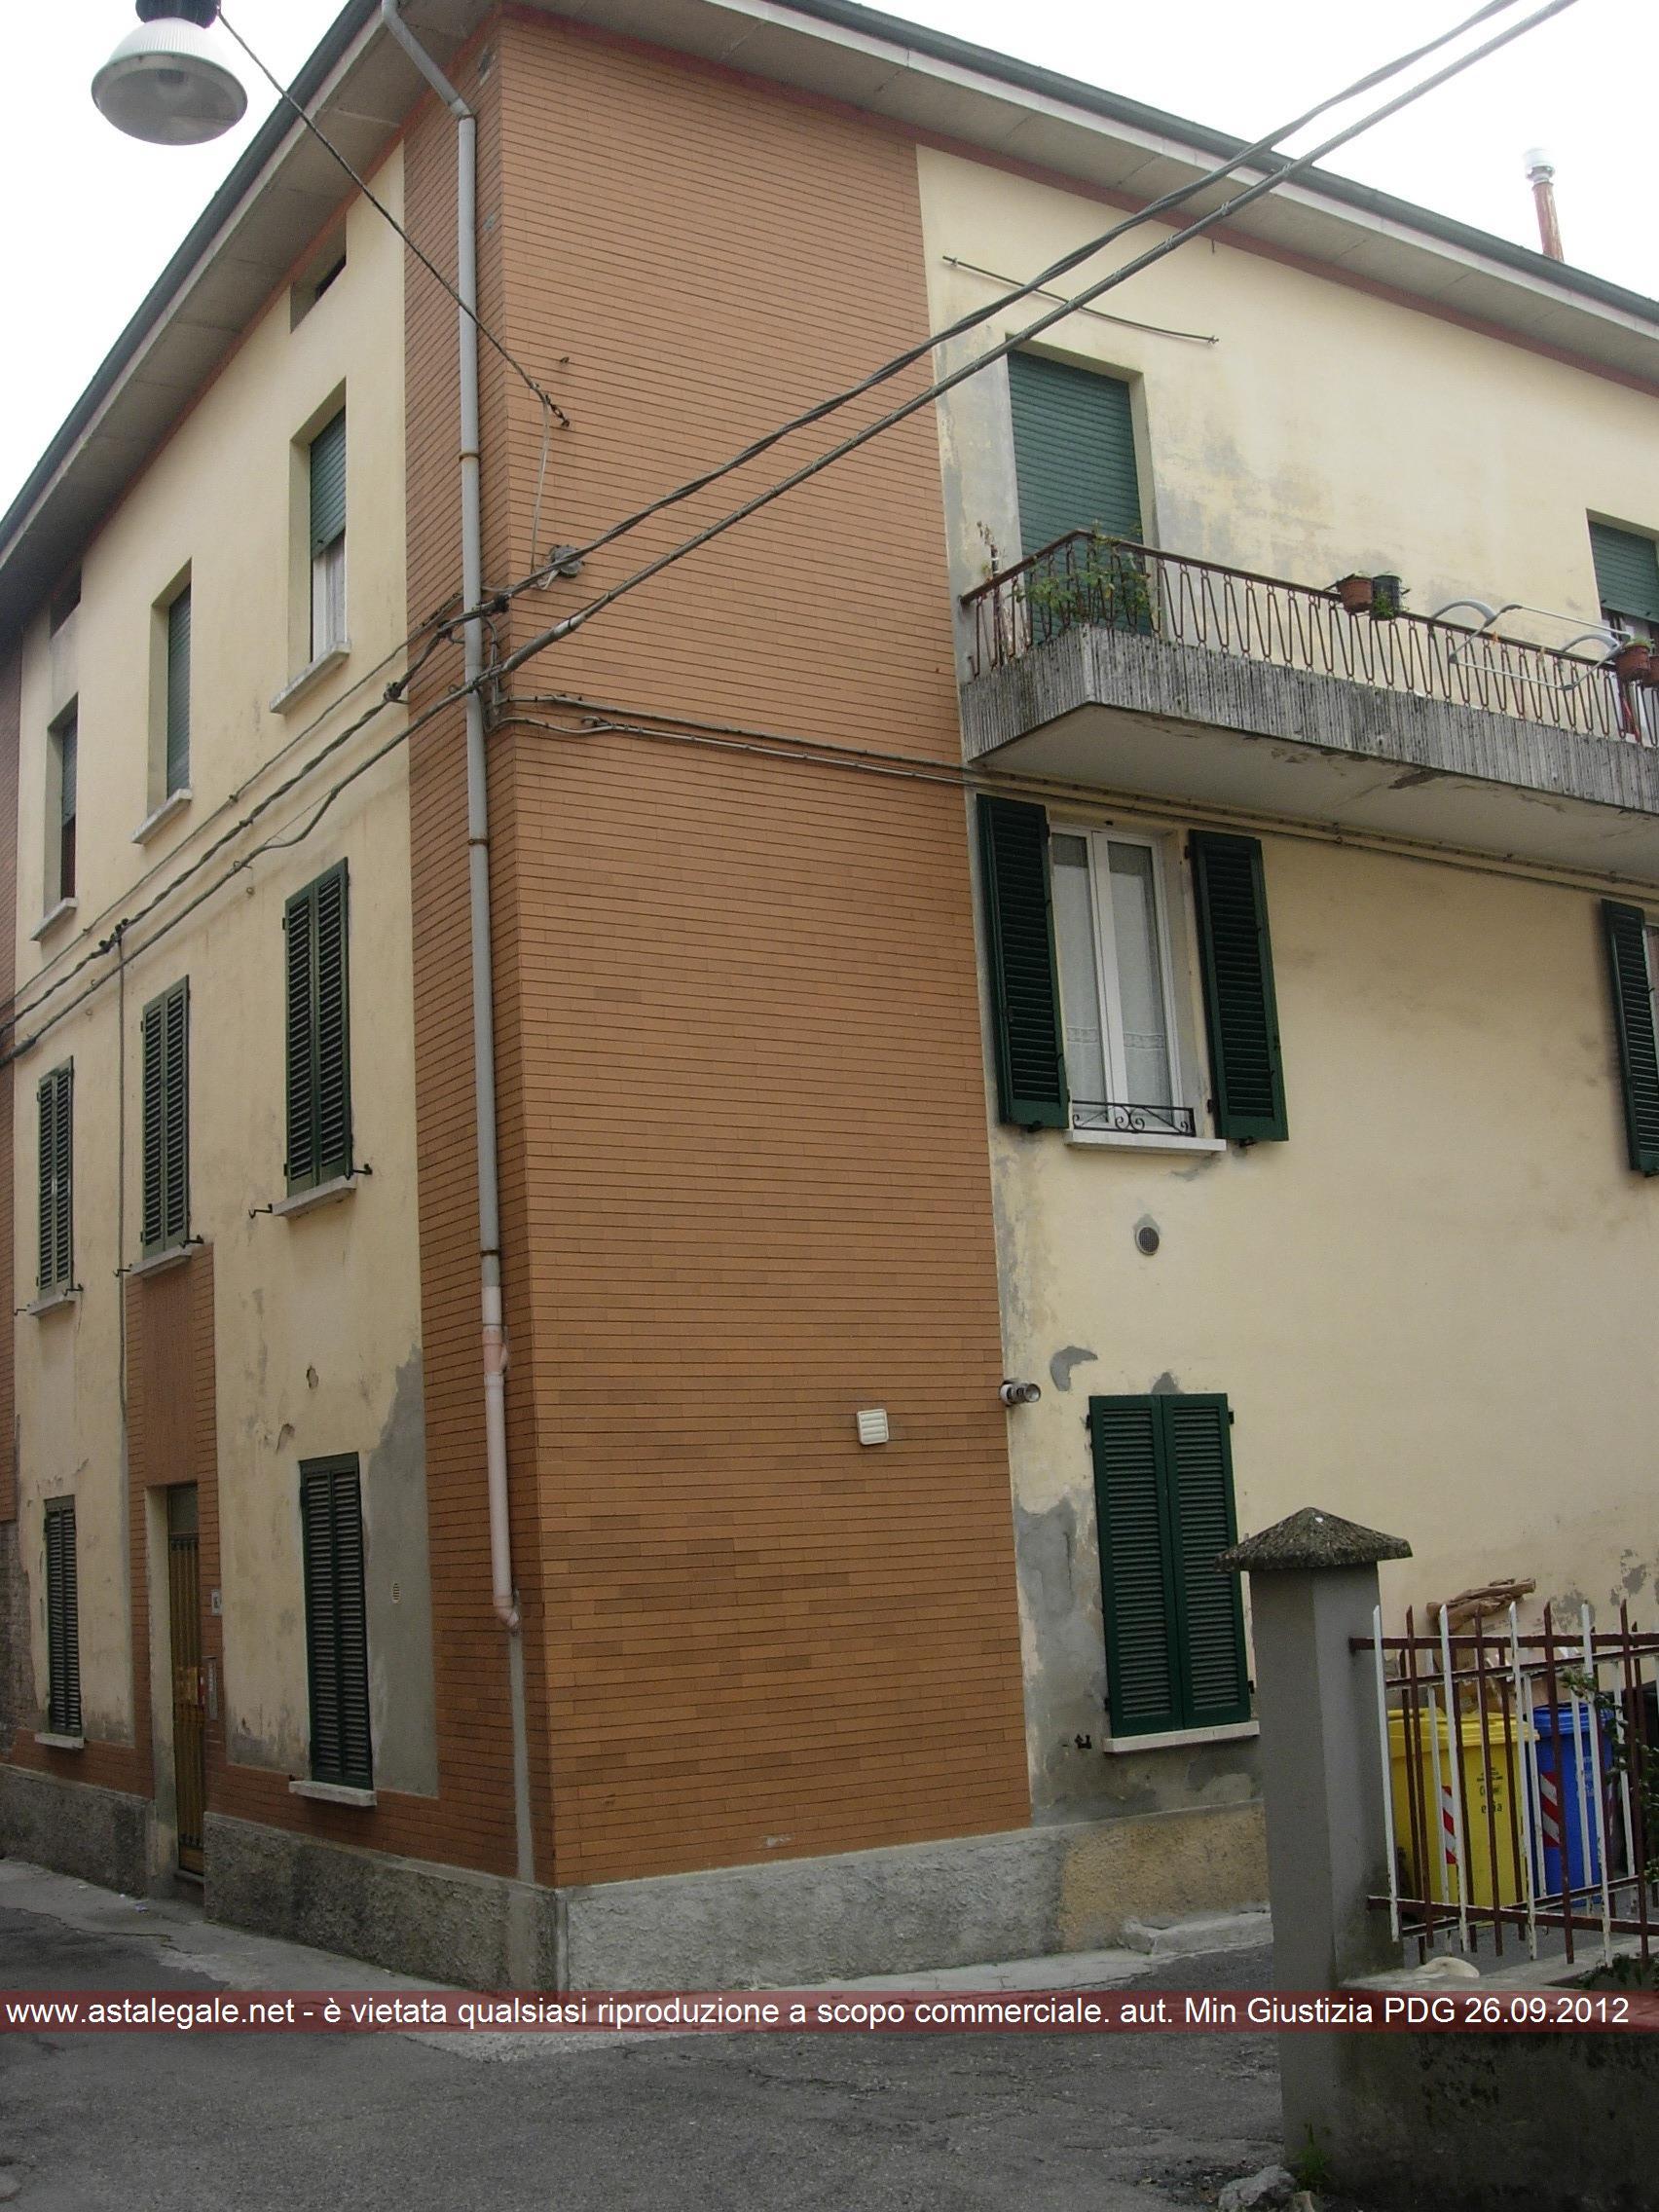 Salsomaggiore Terme (PR) Via Antelami 16